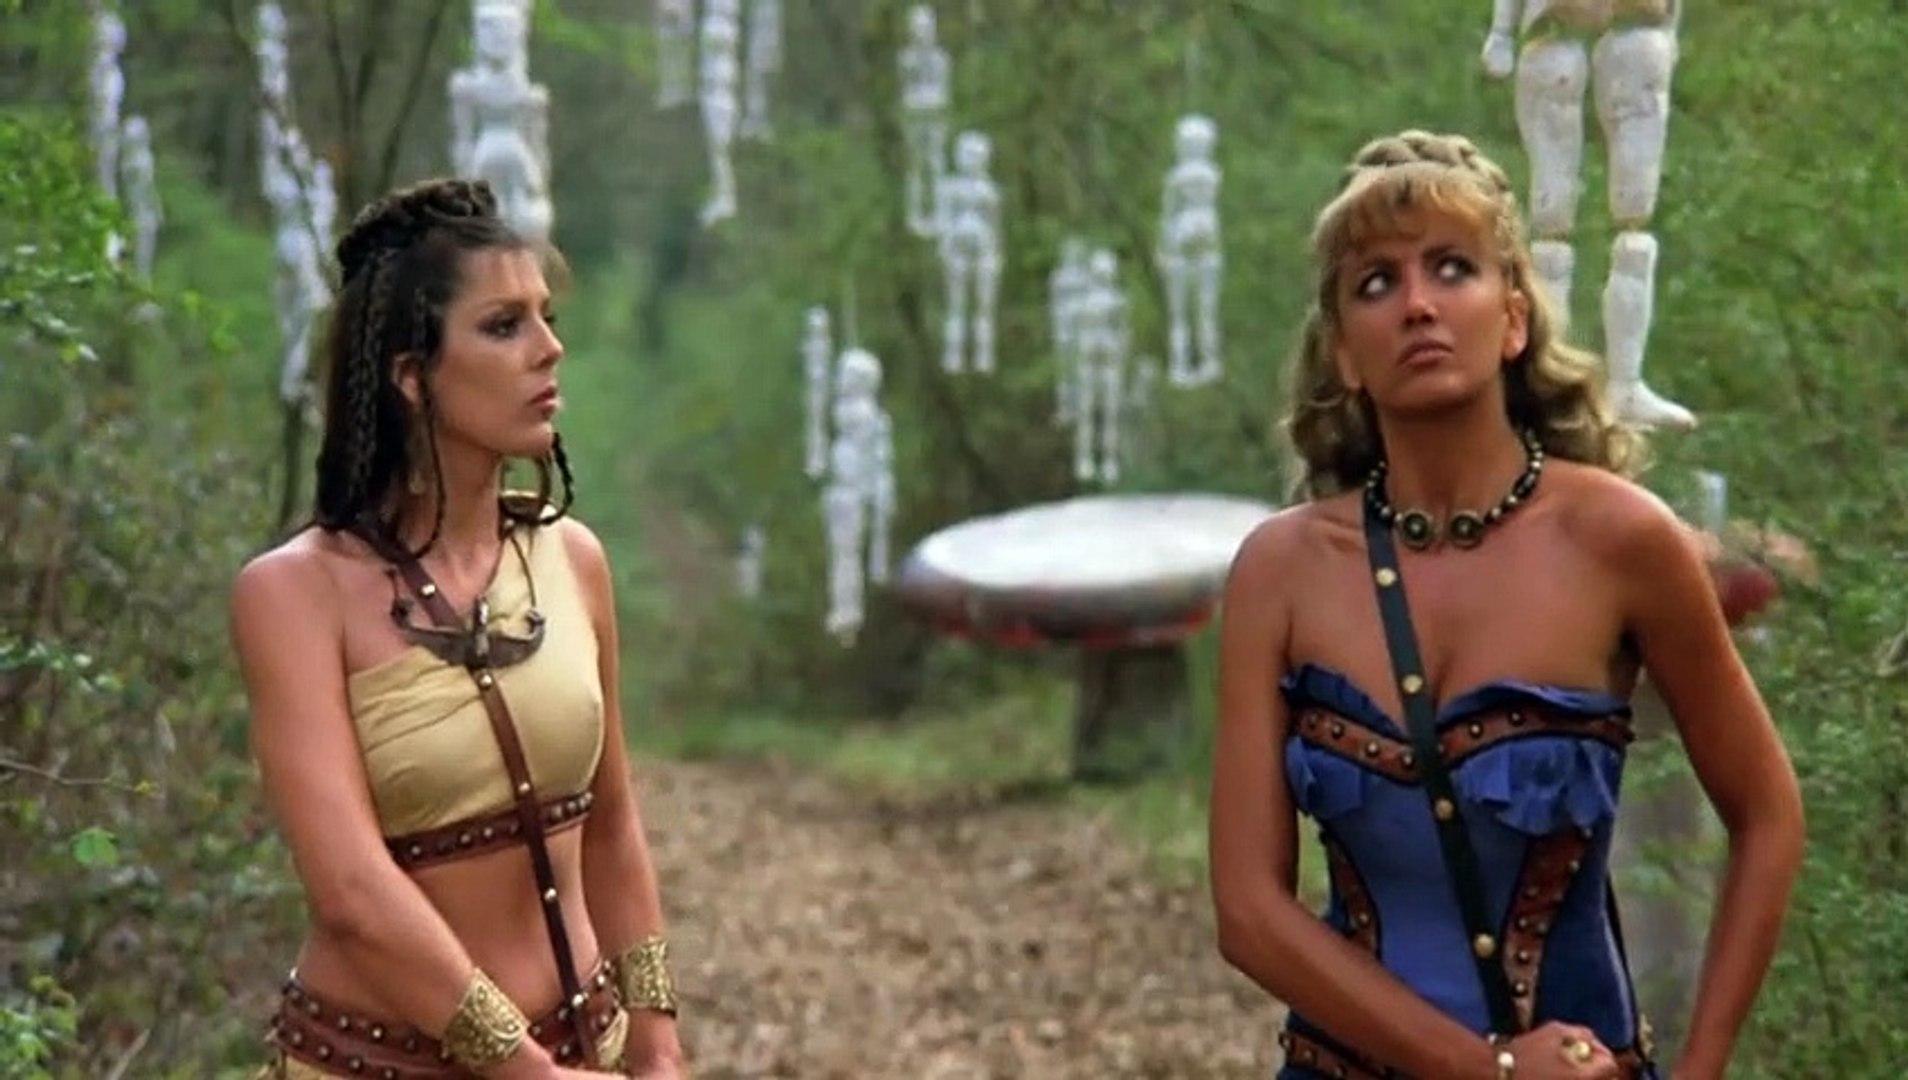 The Adventures of Hercules (1985) - (Adventure, Fantasy)